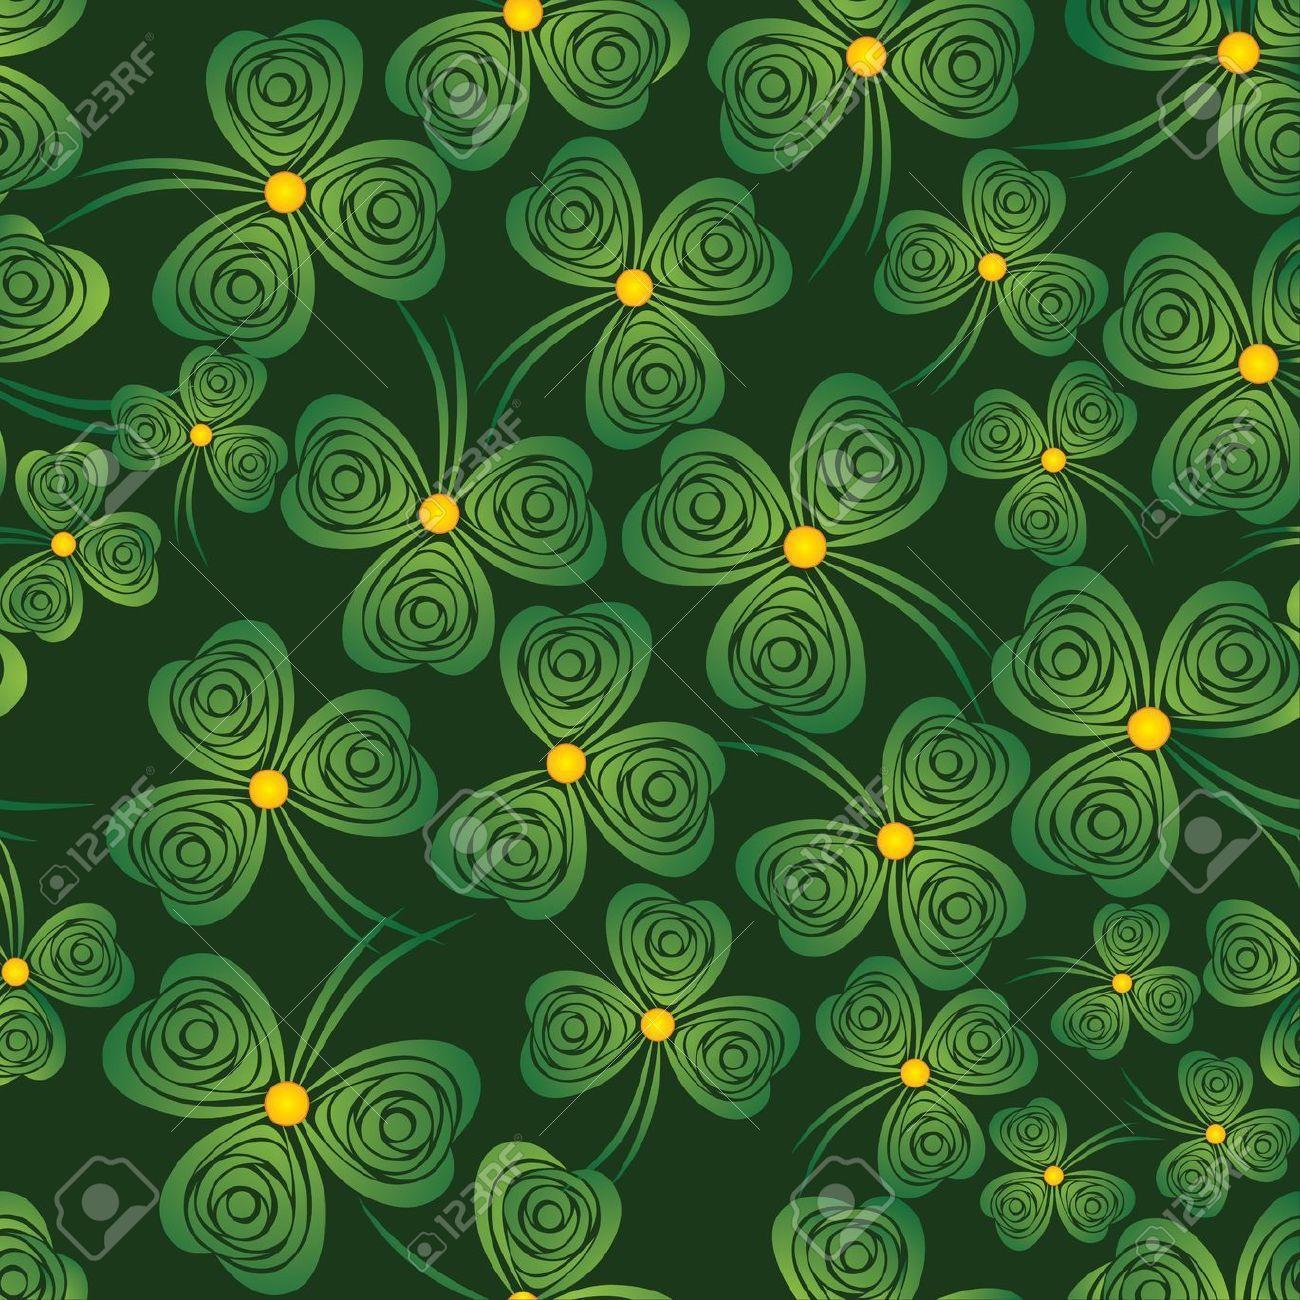 St Patrick Wallpaper: Shamrocks Wallpapers